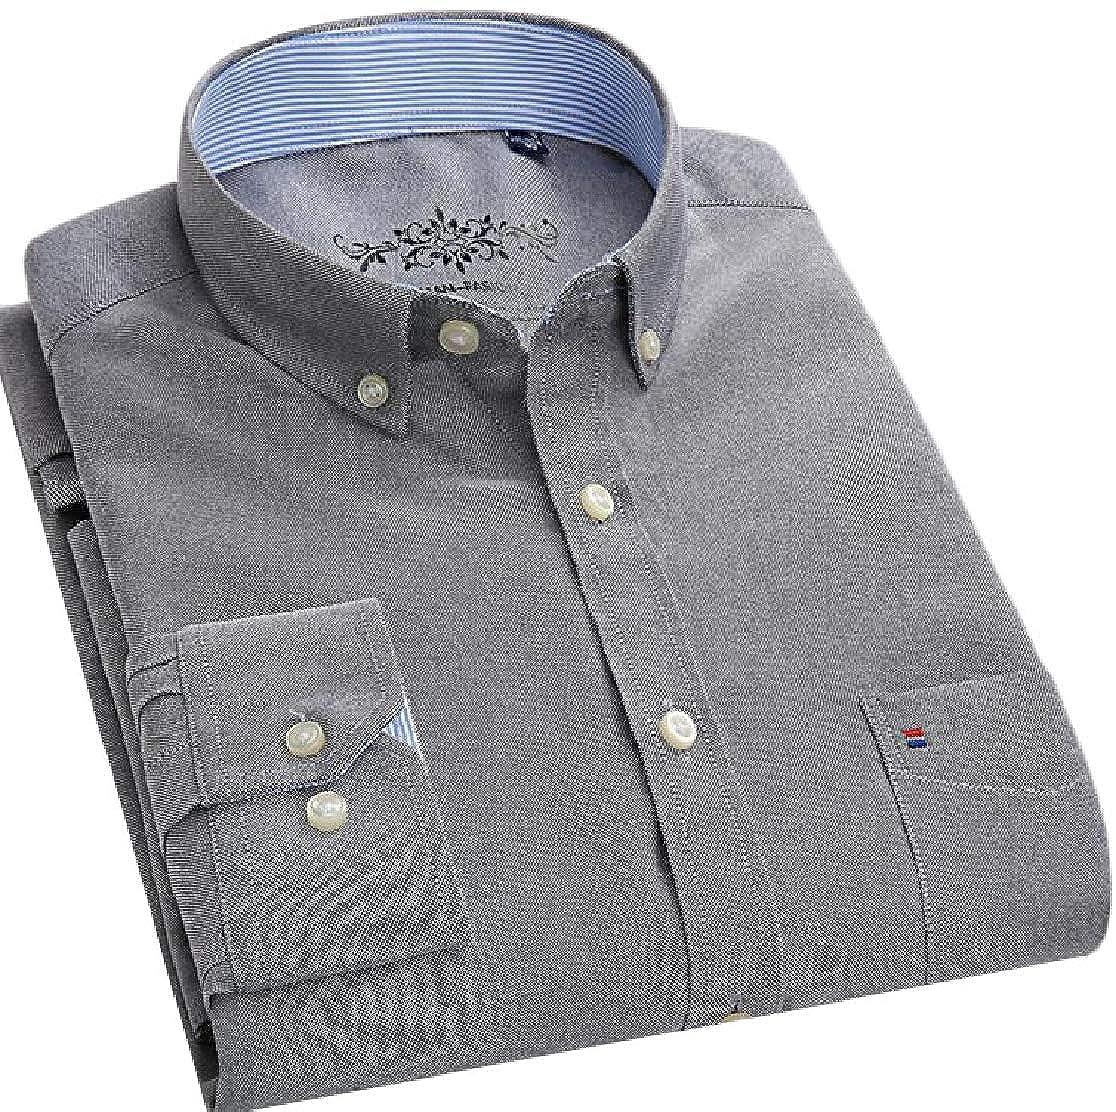 Joe Wenko Mens Casual Striped Plaid Long Sleeve Oxford Button Down Shirts